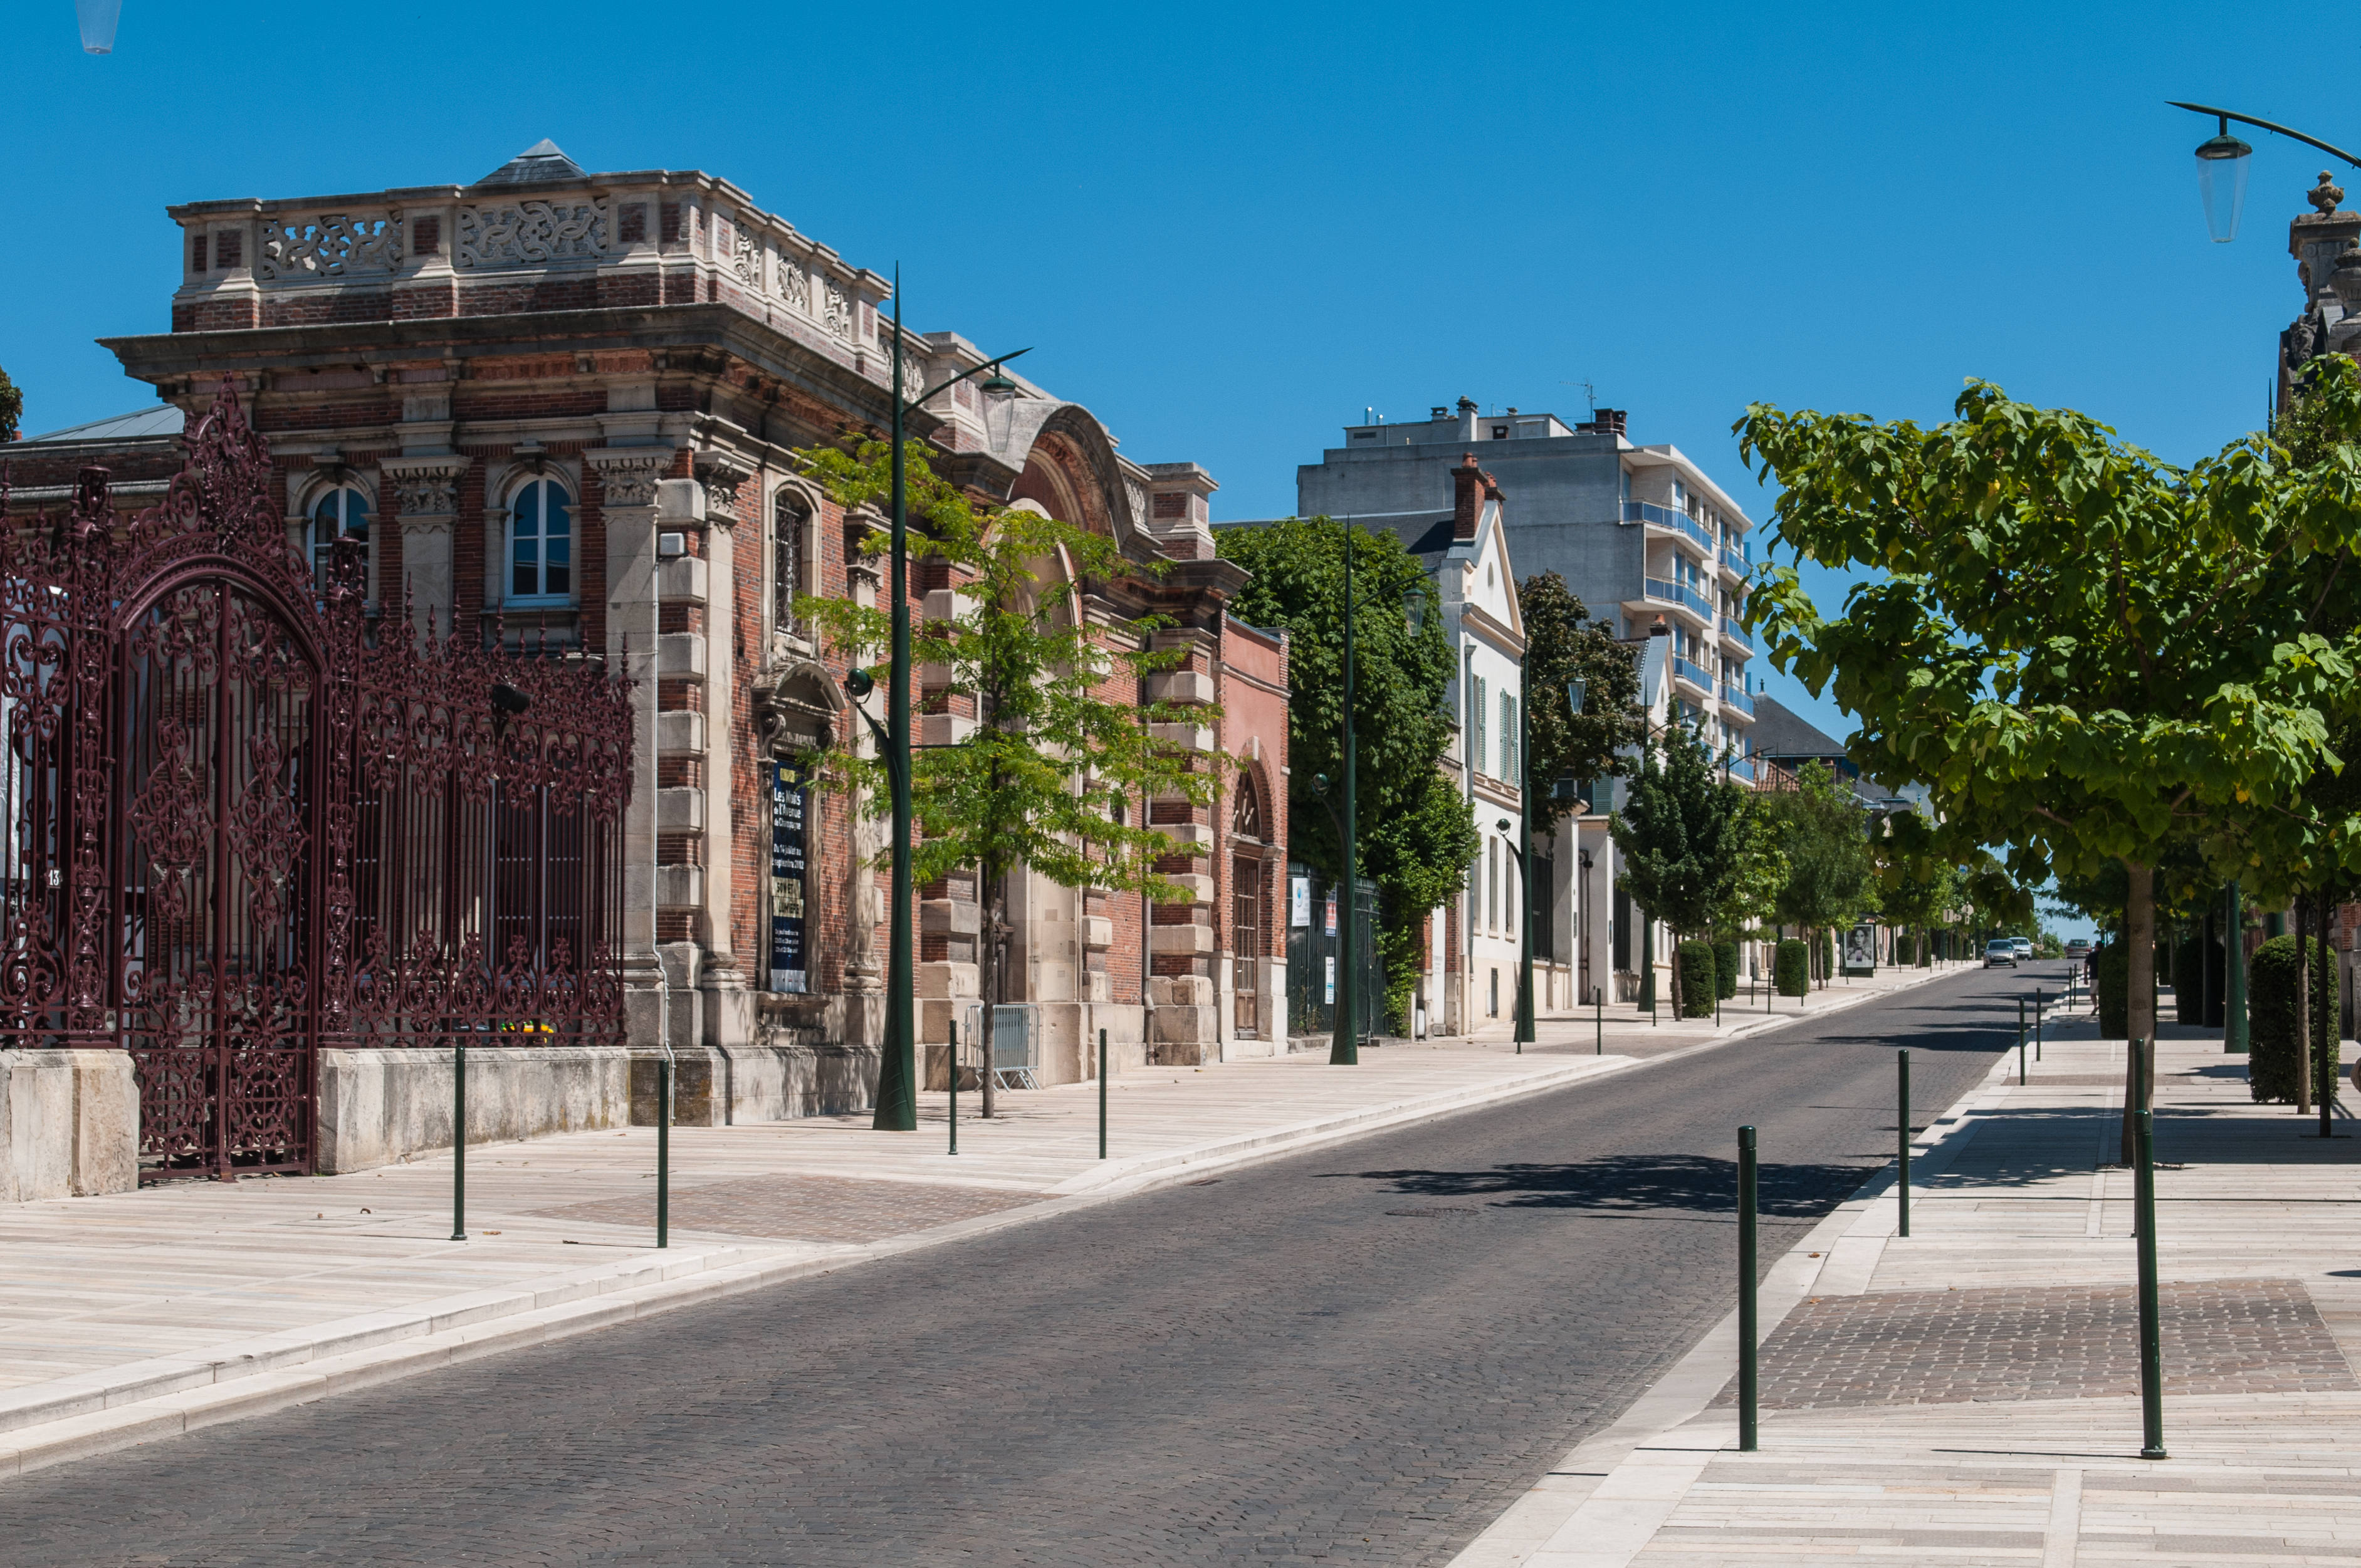 Ficheiro:Avenue de Champagne, Épernay (8132669246).jpg